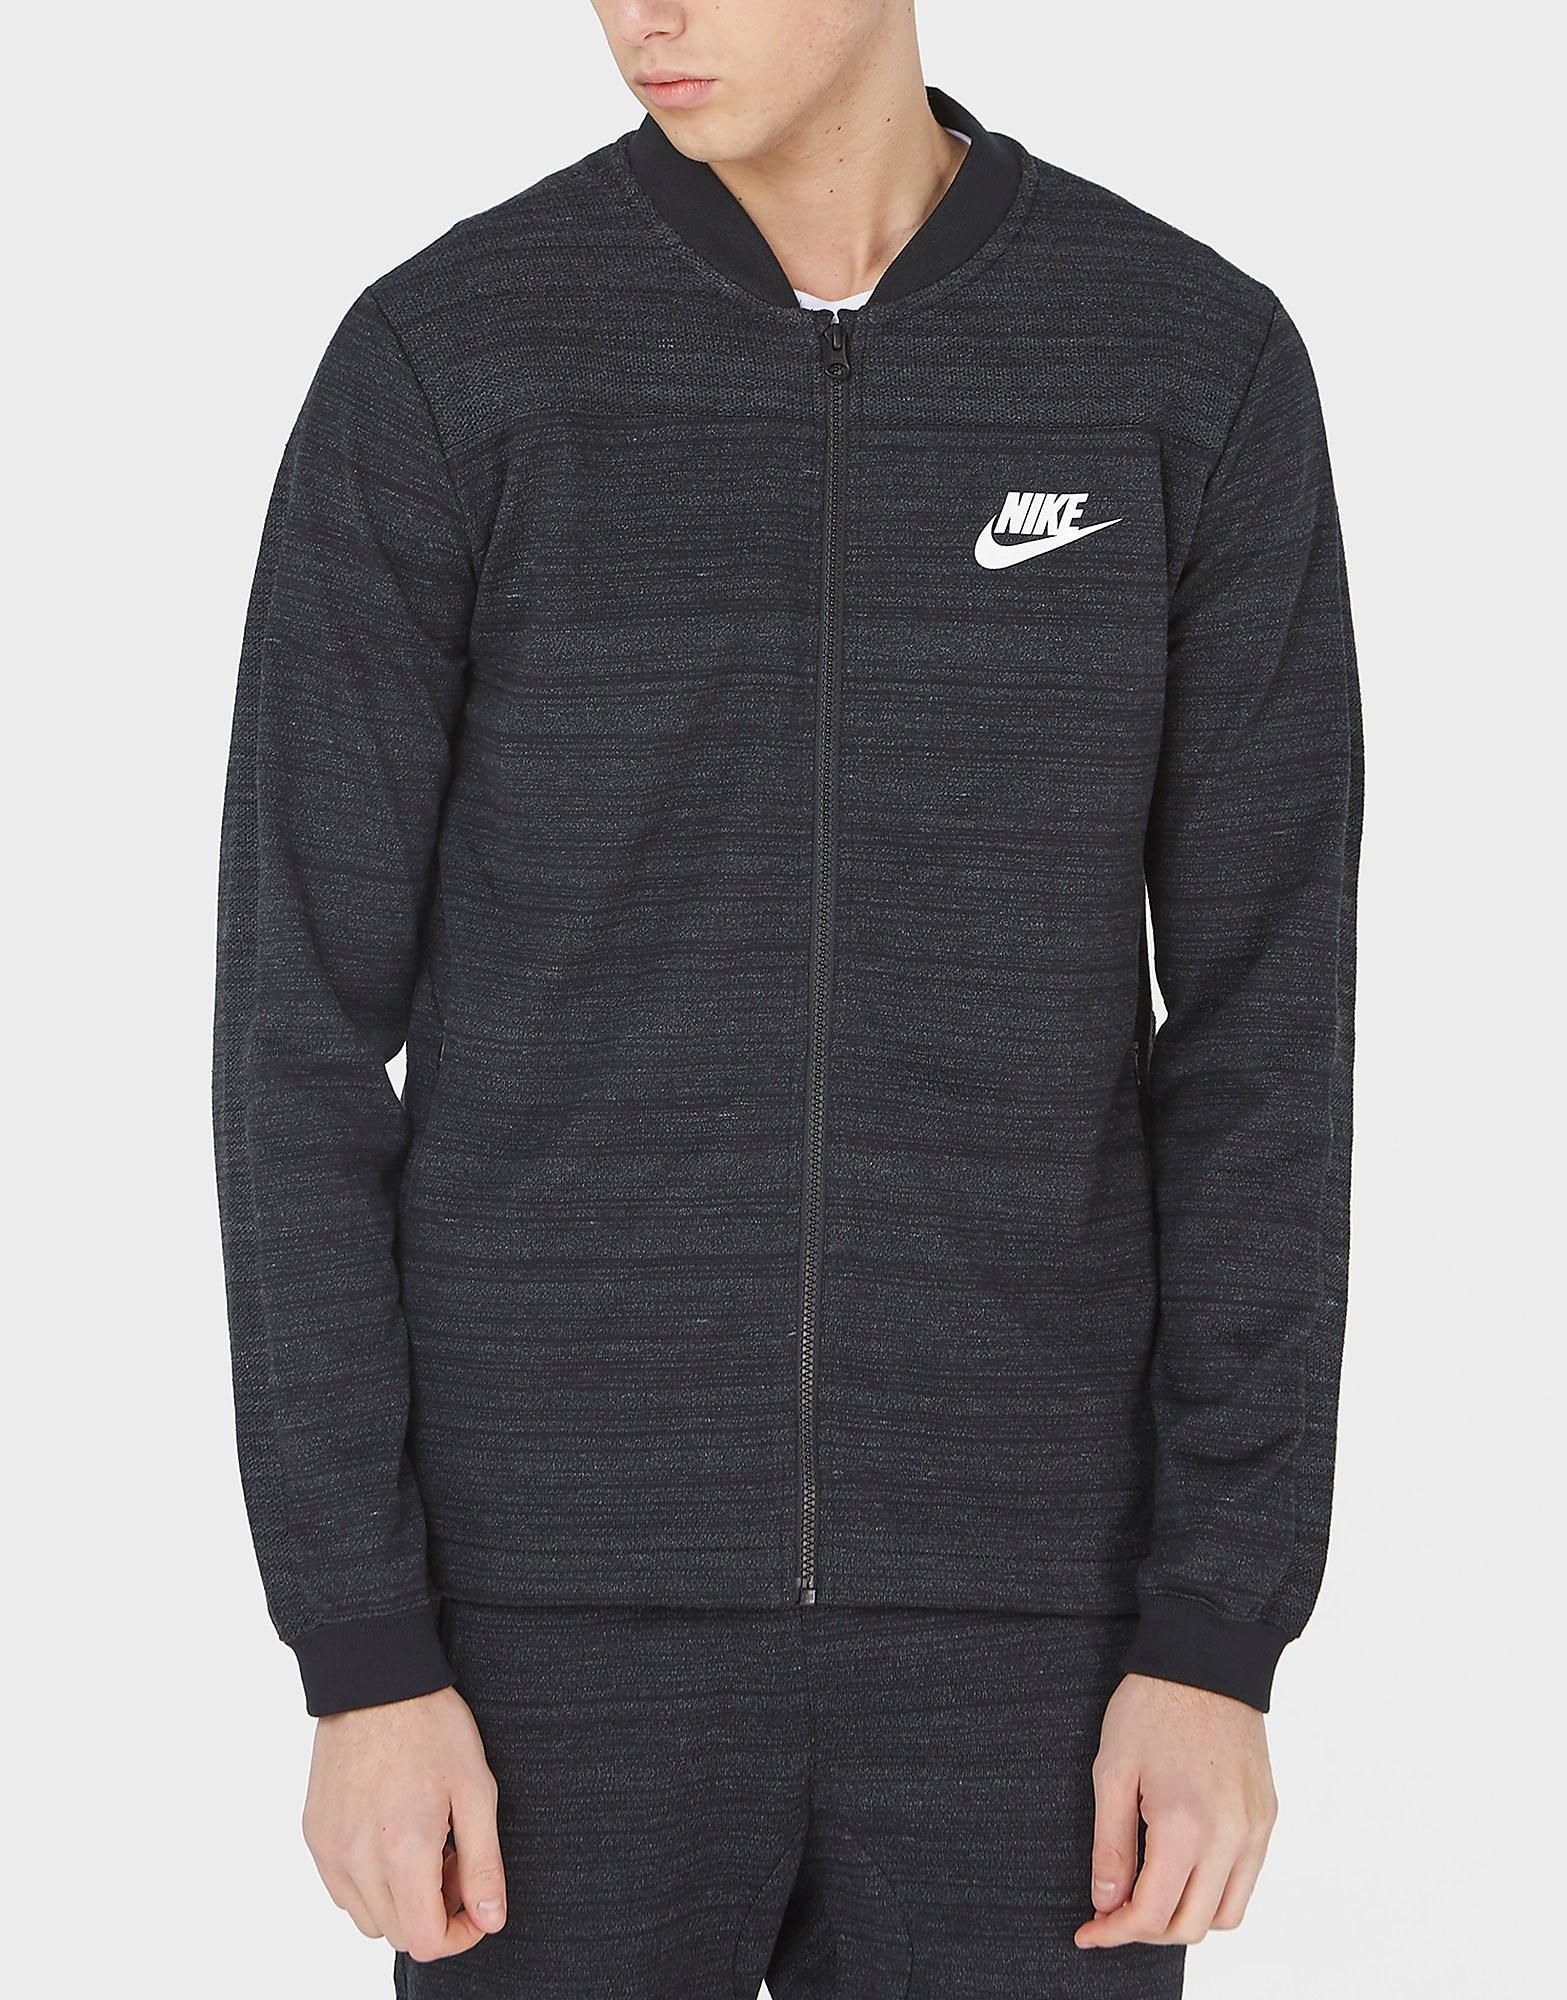 Nike Advance Knit Track Top